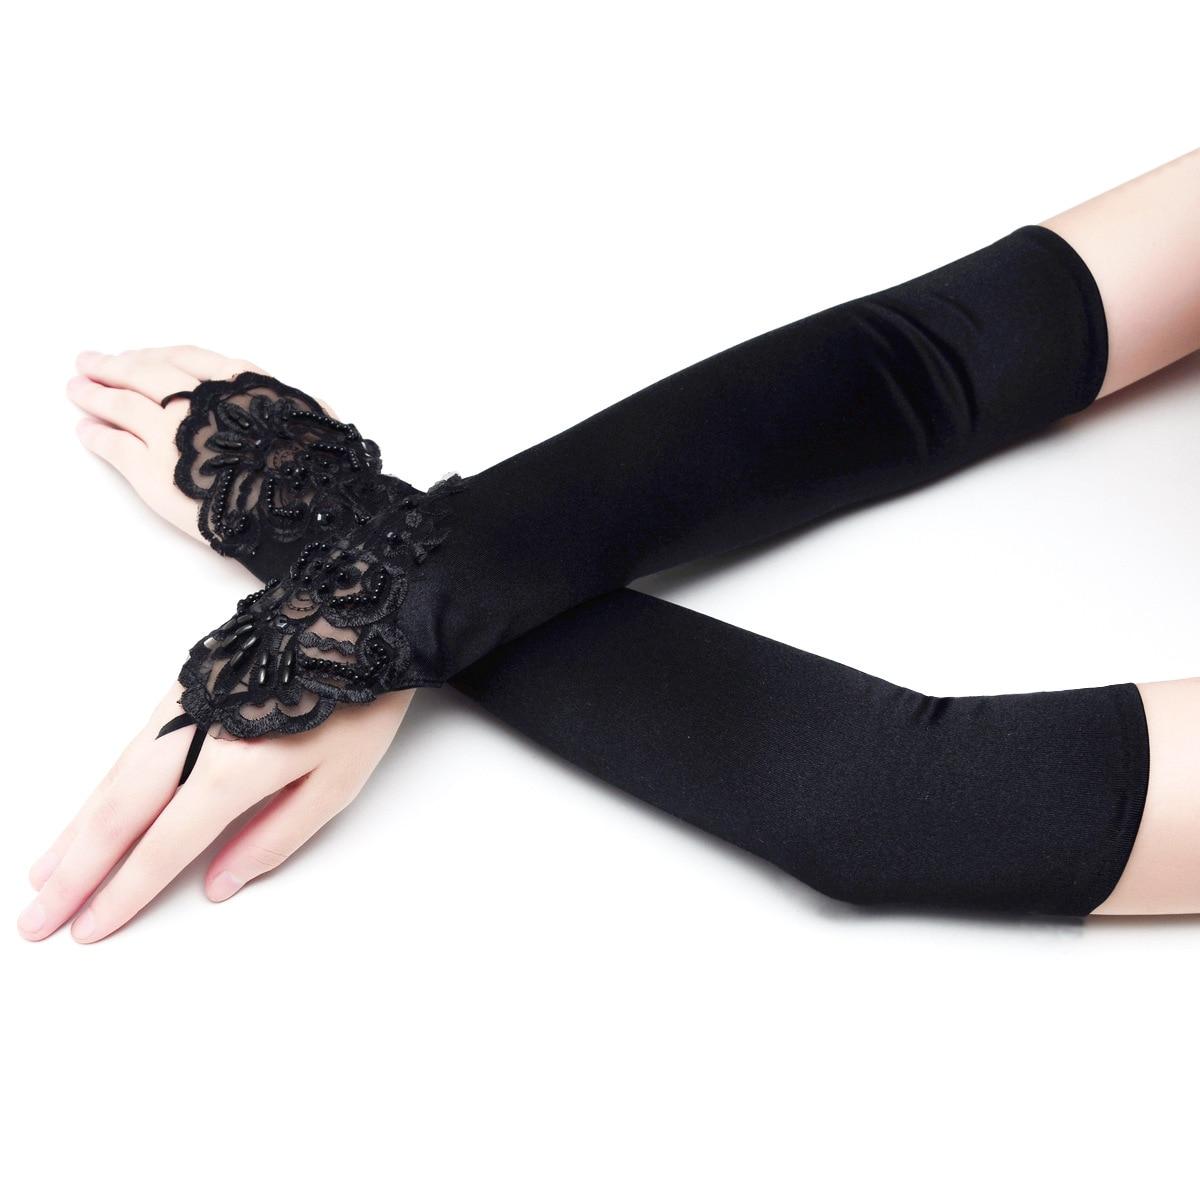 Bridal Wedding Veil Dress Gloves Lengthen Fingerless Small Floral Embroidered And Tablet M White Black Red Gloves